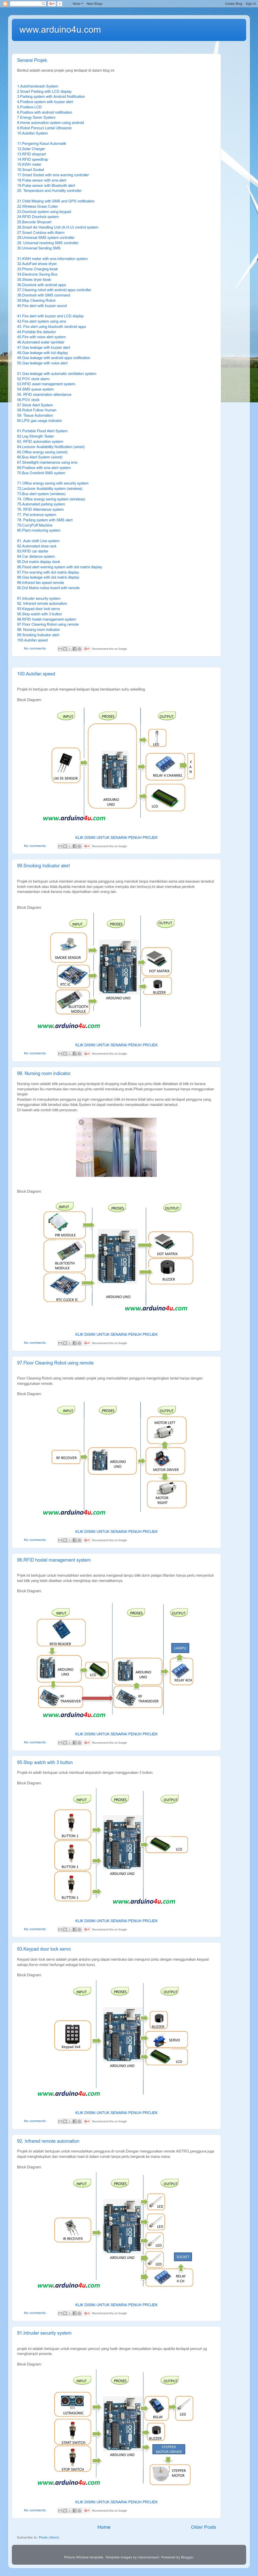 Arduino4u Competitors, Revenue and Employees - Owler Company Profile